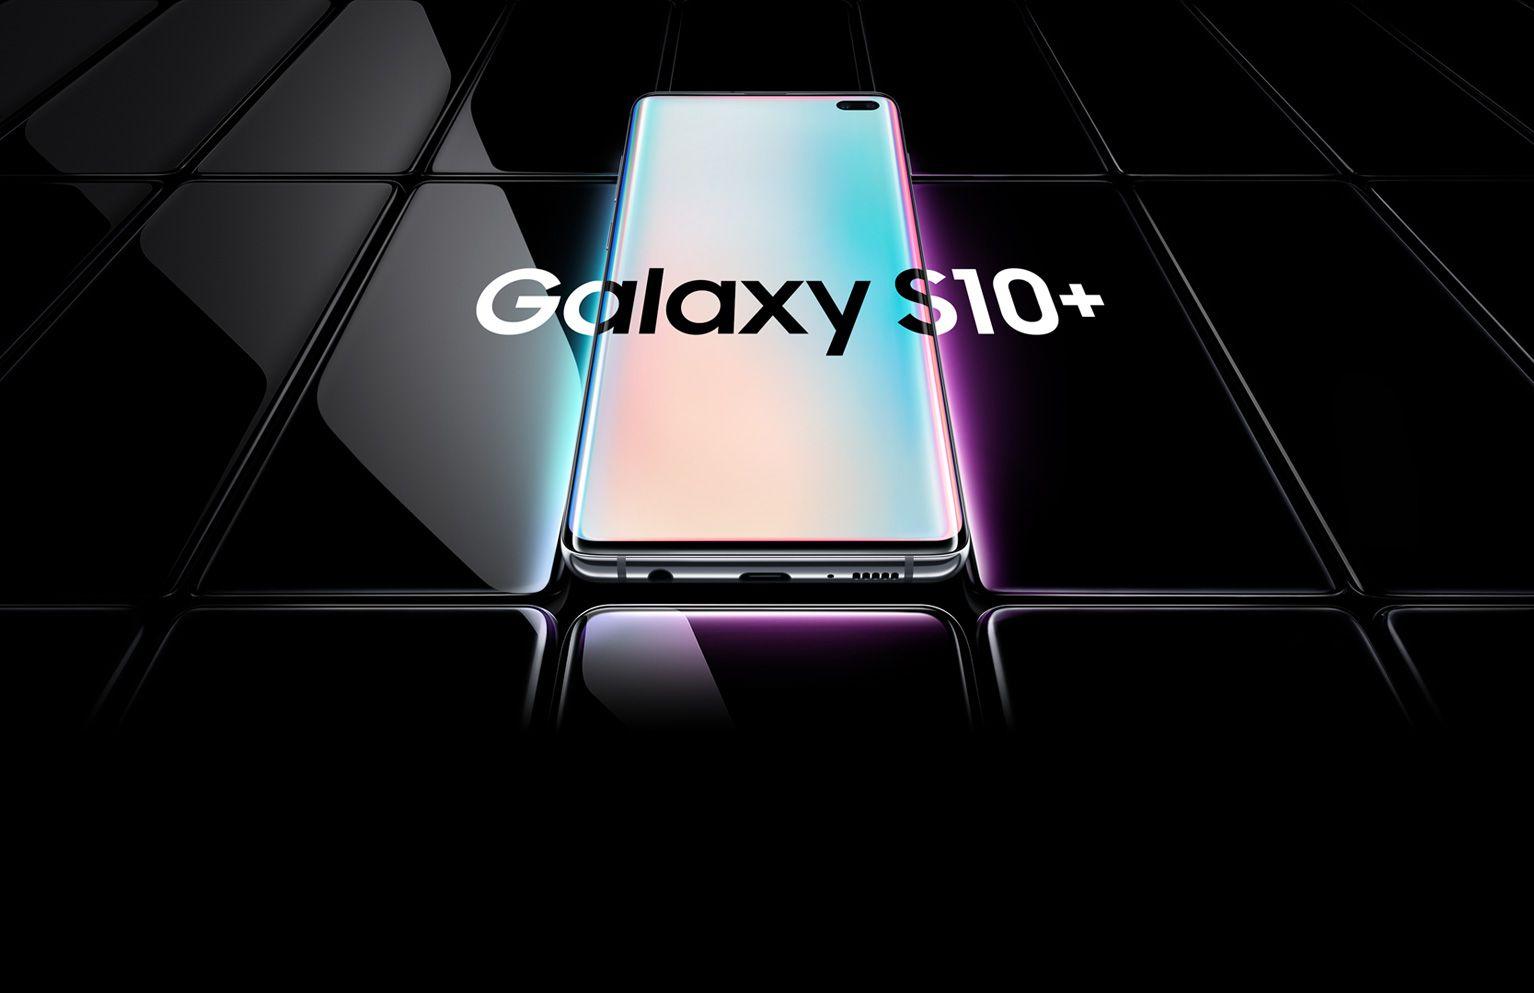 Bon plan : Samsung Galaxy S10 Plus à 685 euros chez Fnac marketplace !